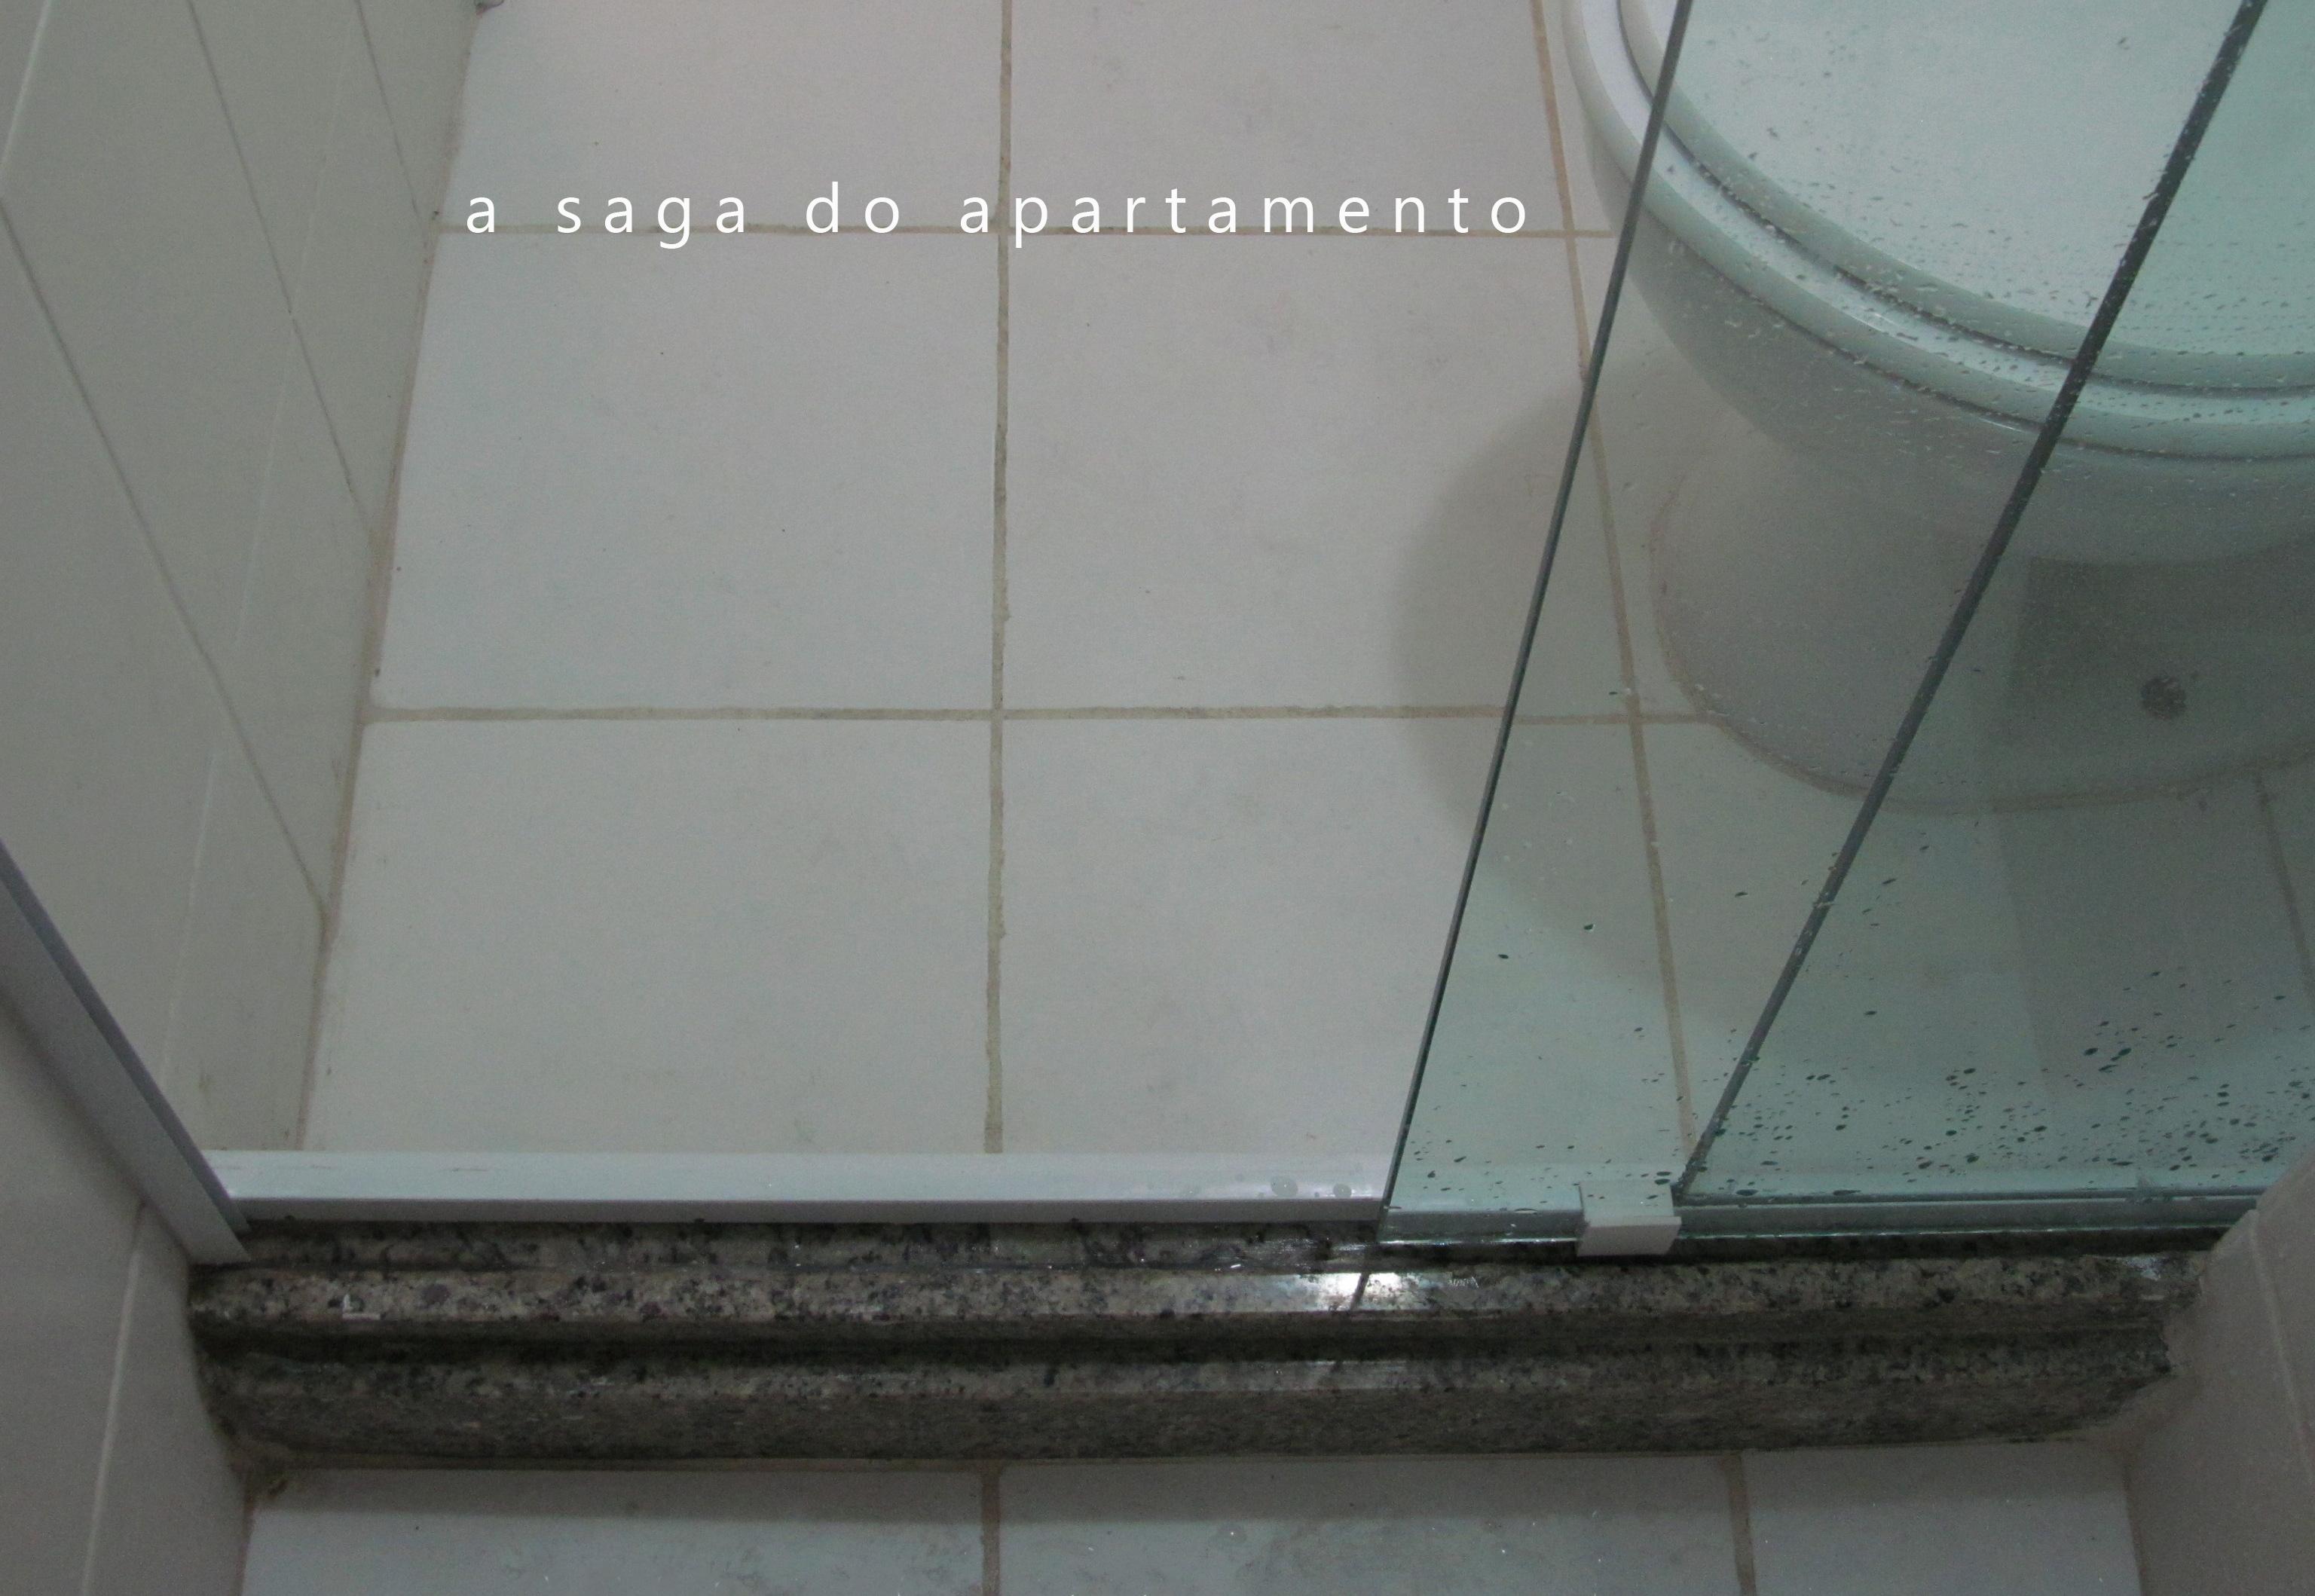 Reavaliando (e Refazendo!) o Box Blindex a saga do apartamento #5D6A6E 3072 2118